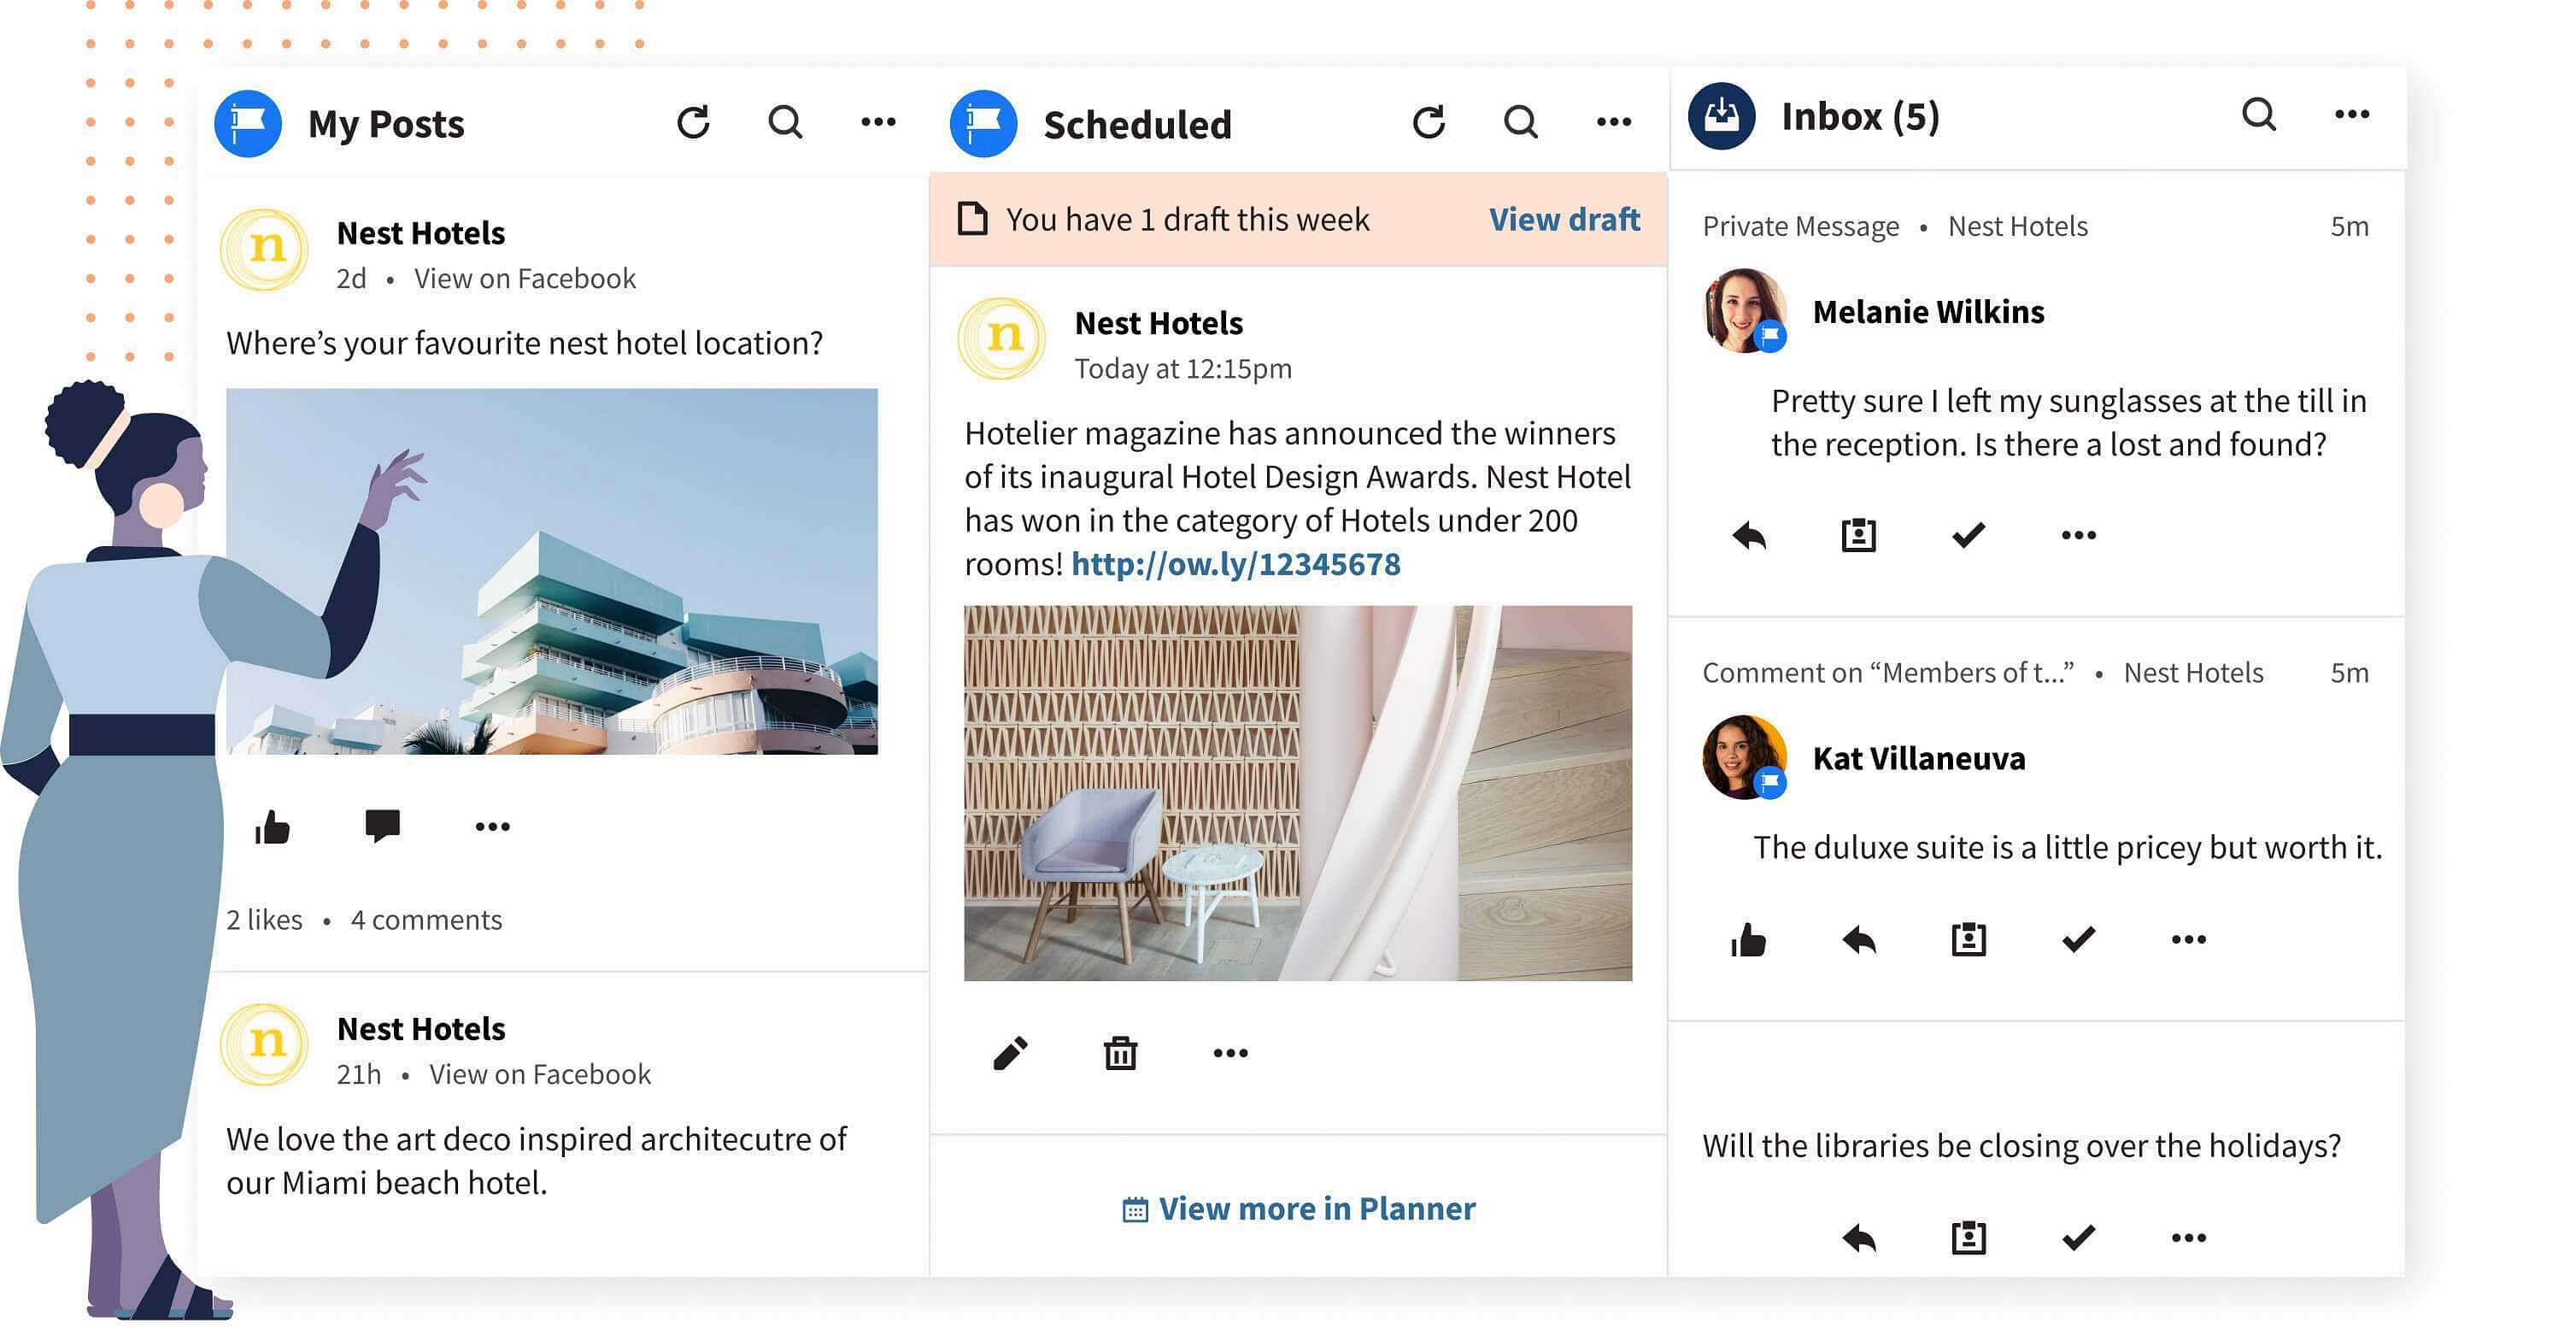 hootsuite social media platform and social media manager